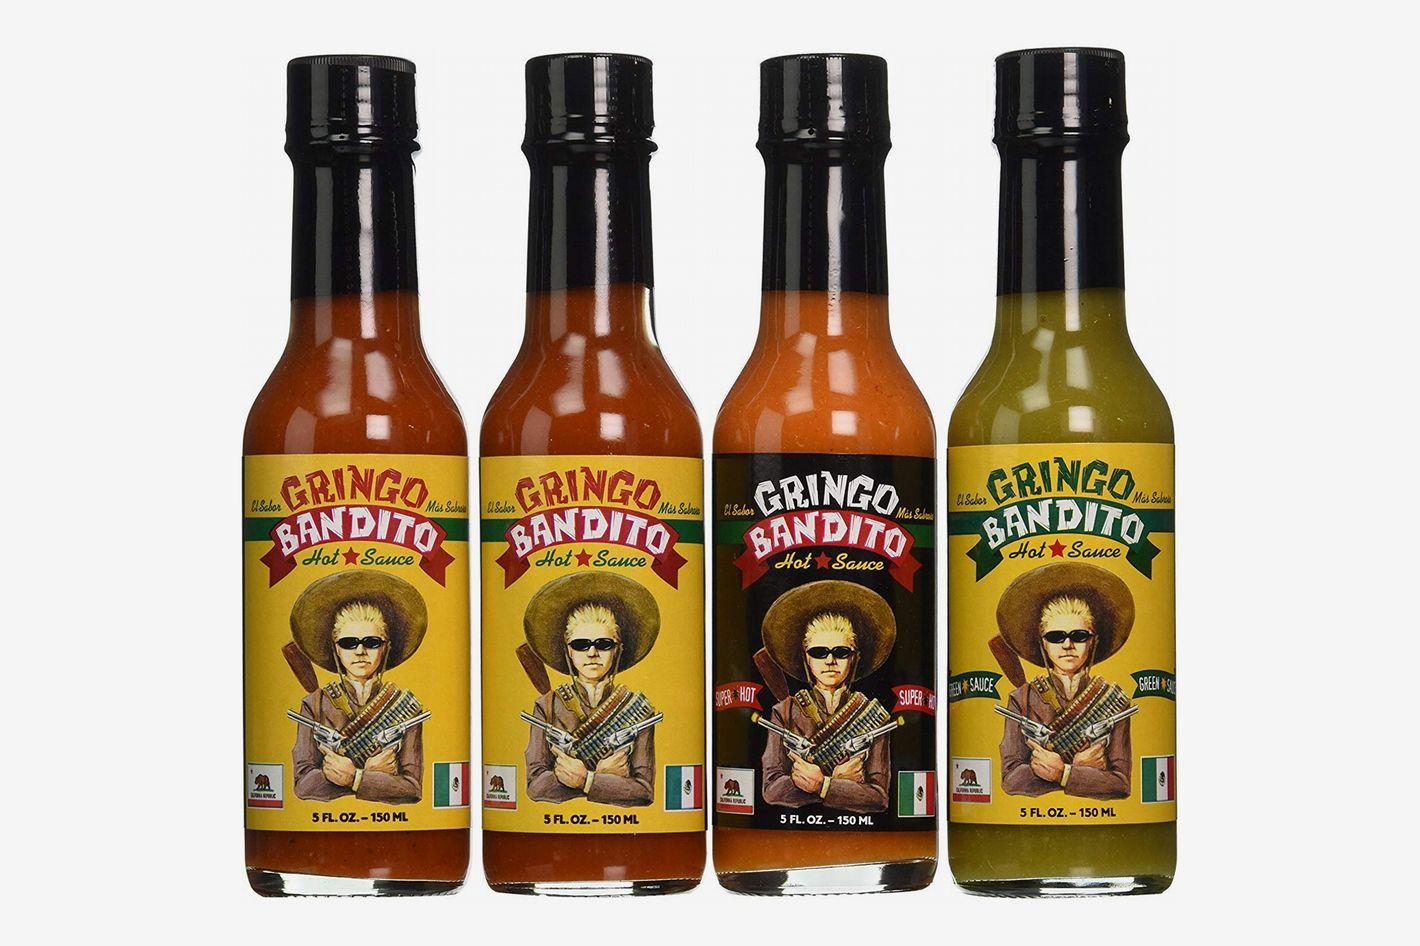 Gringo Bandito O.G. Hot Sauce Variety Pack, 5 oz (4 Pack)